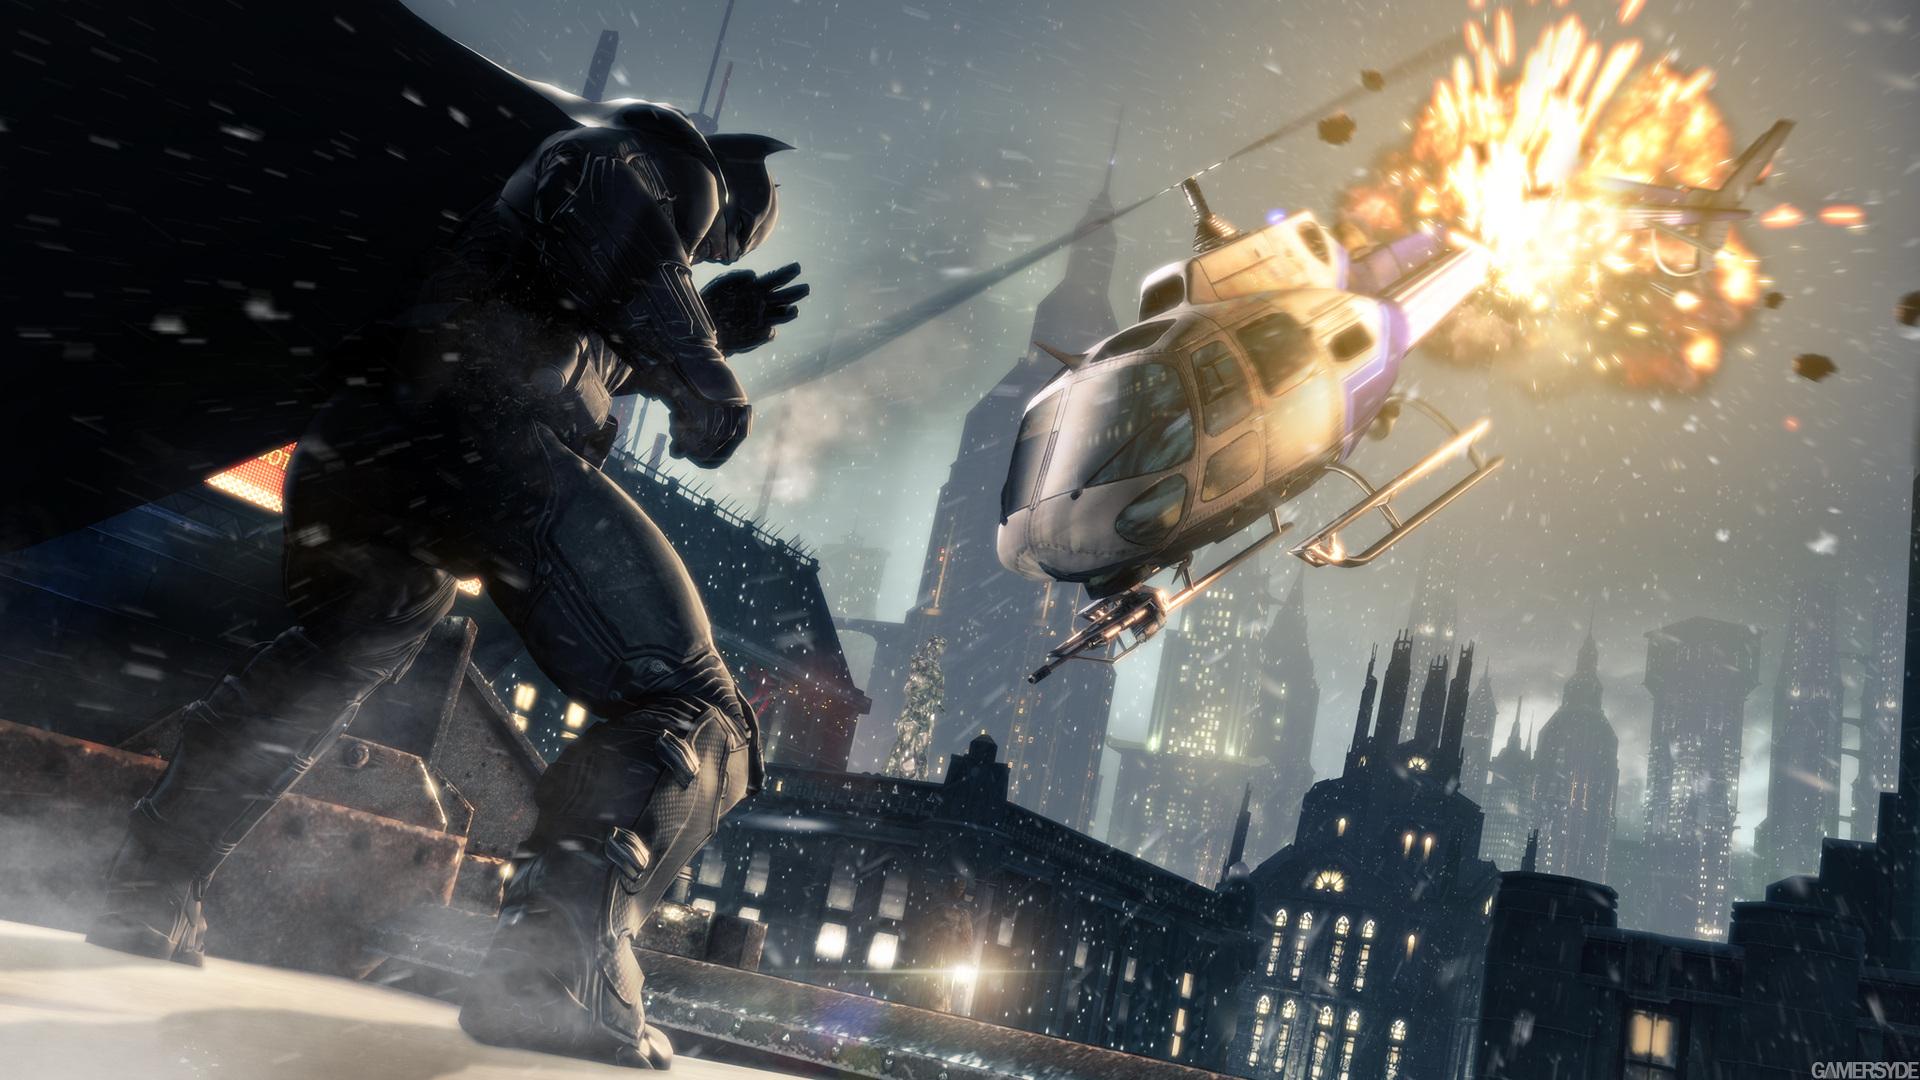 image batman arkham origins 22433 2694 0001 تصاویر جدید از عنوان Batman:Arkham Origins منتشر شد